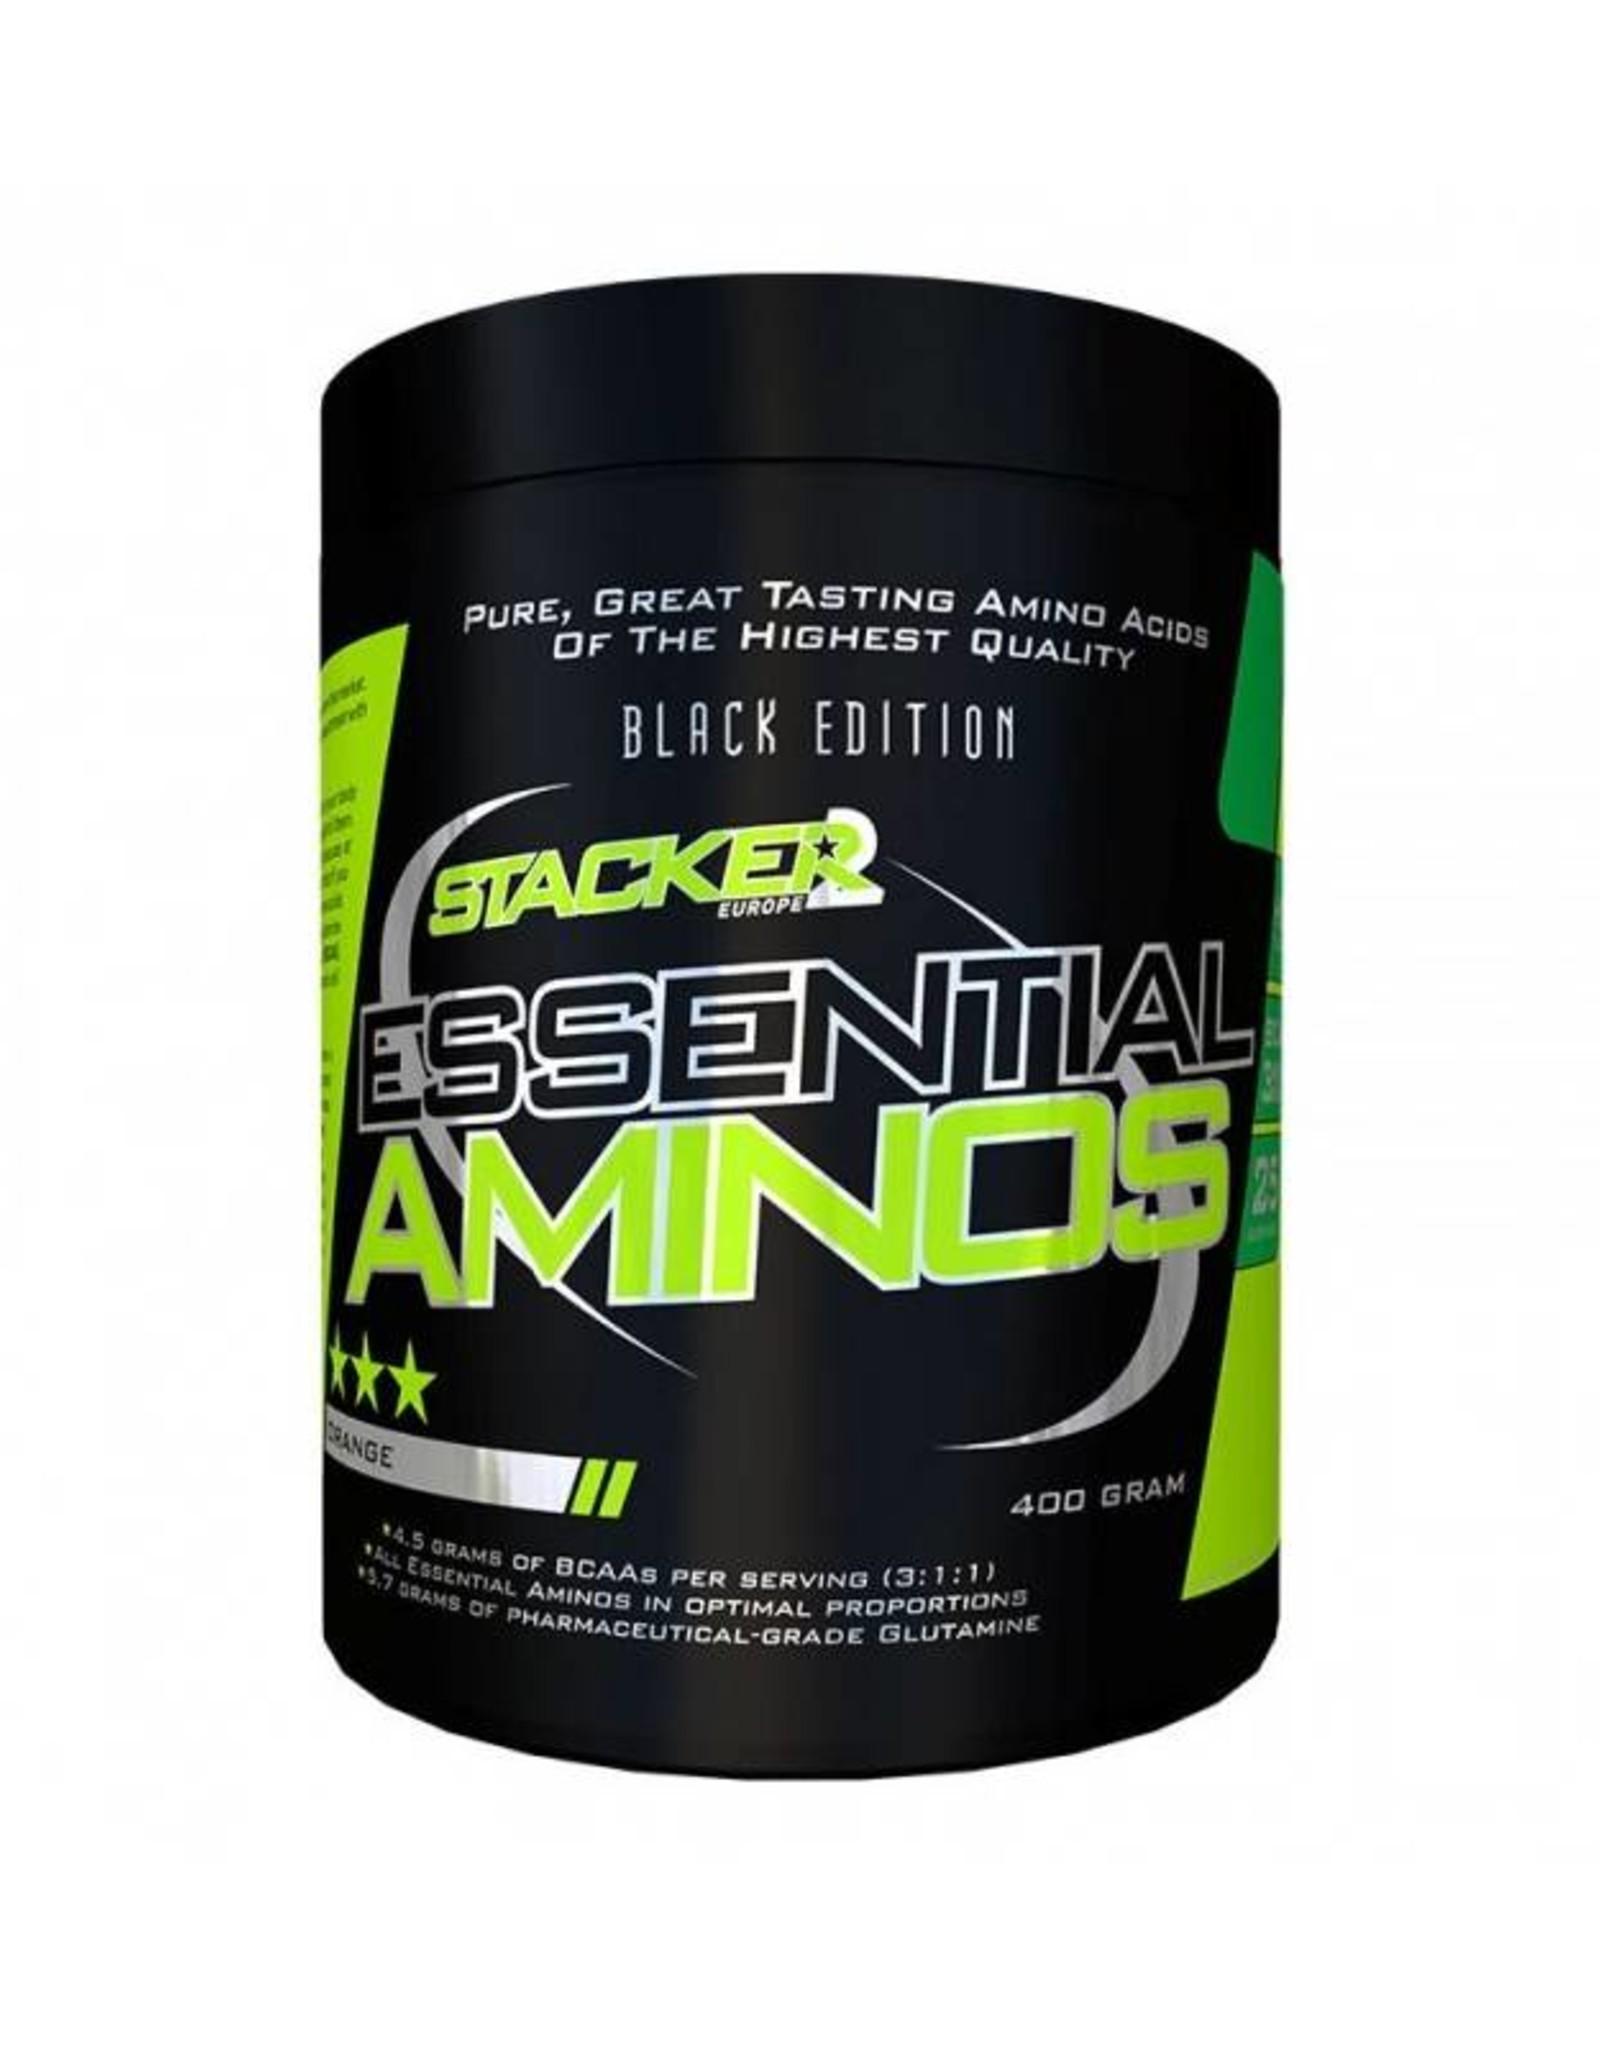 Stacker2  Essential aminos 400 gram